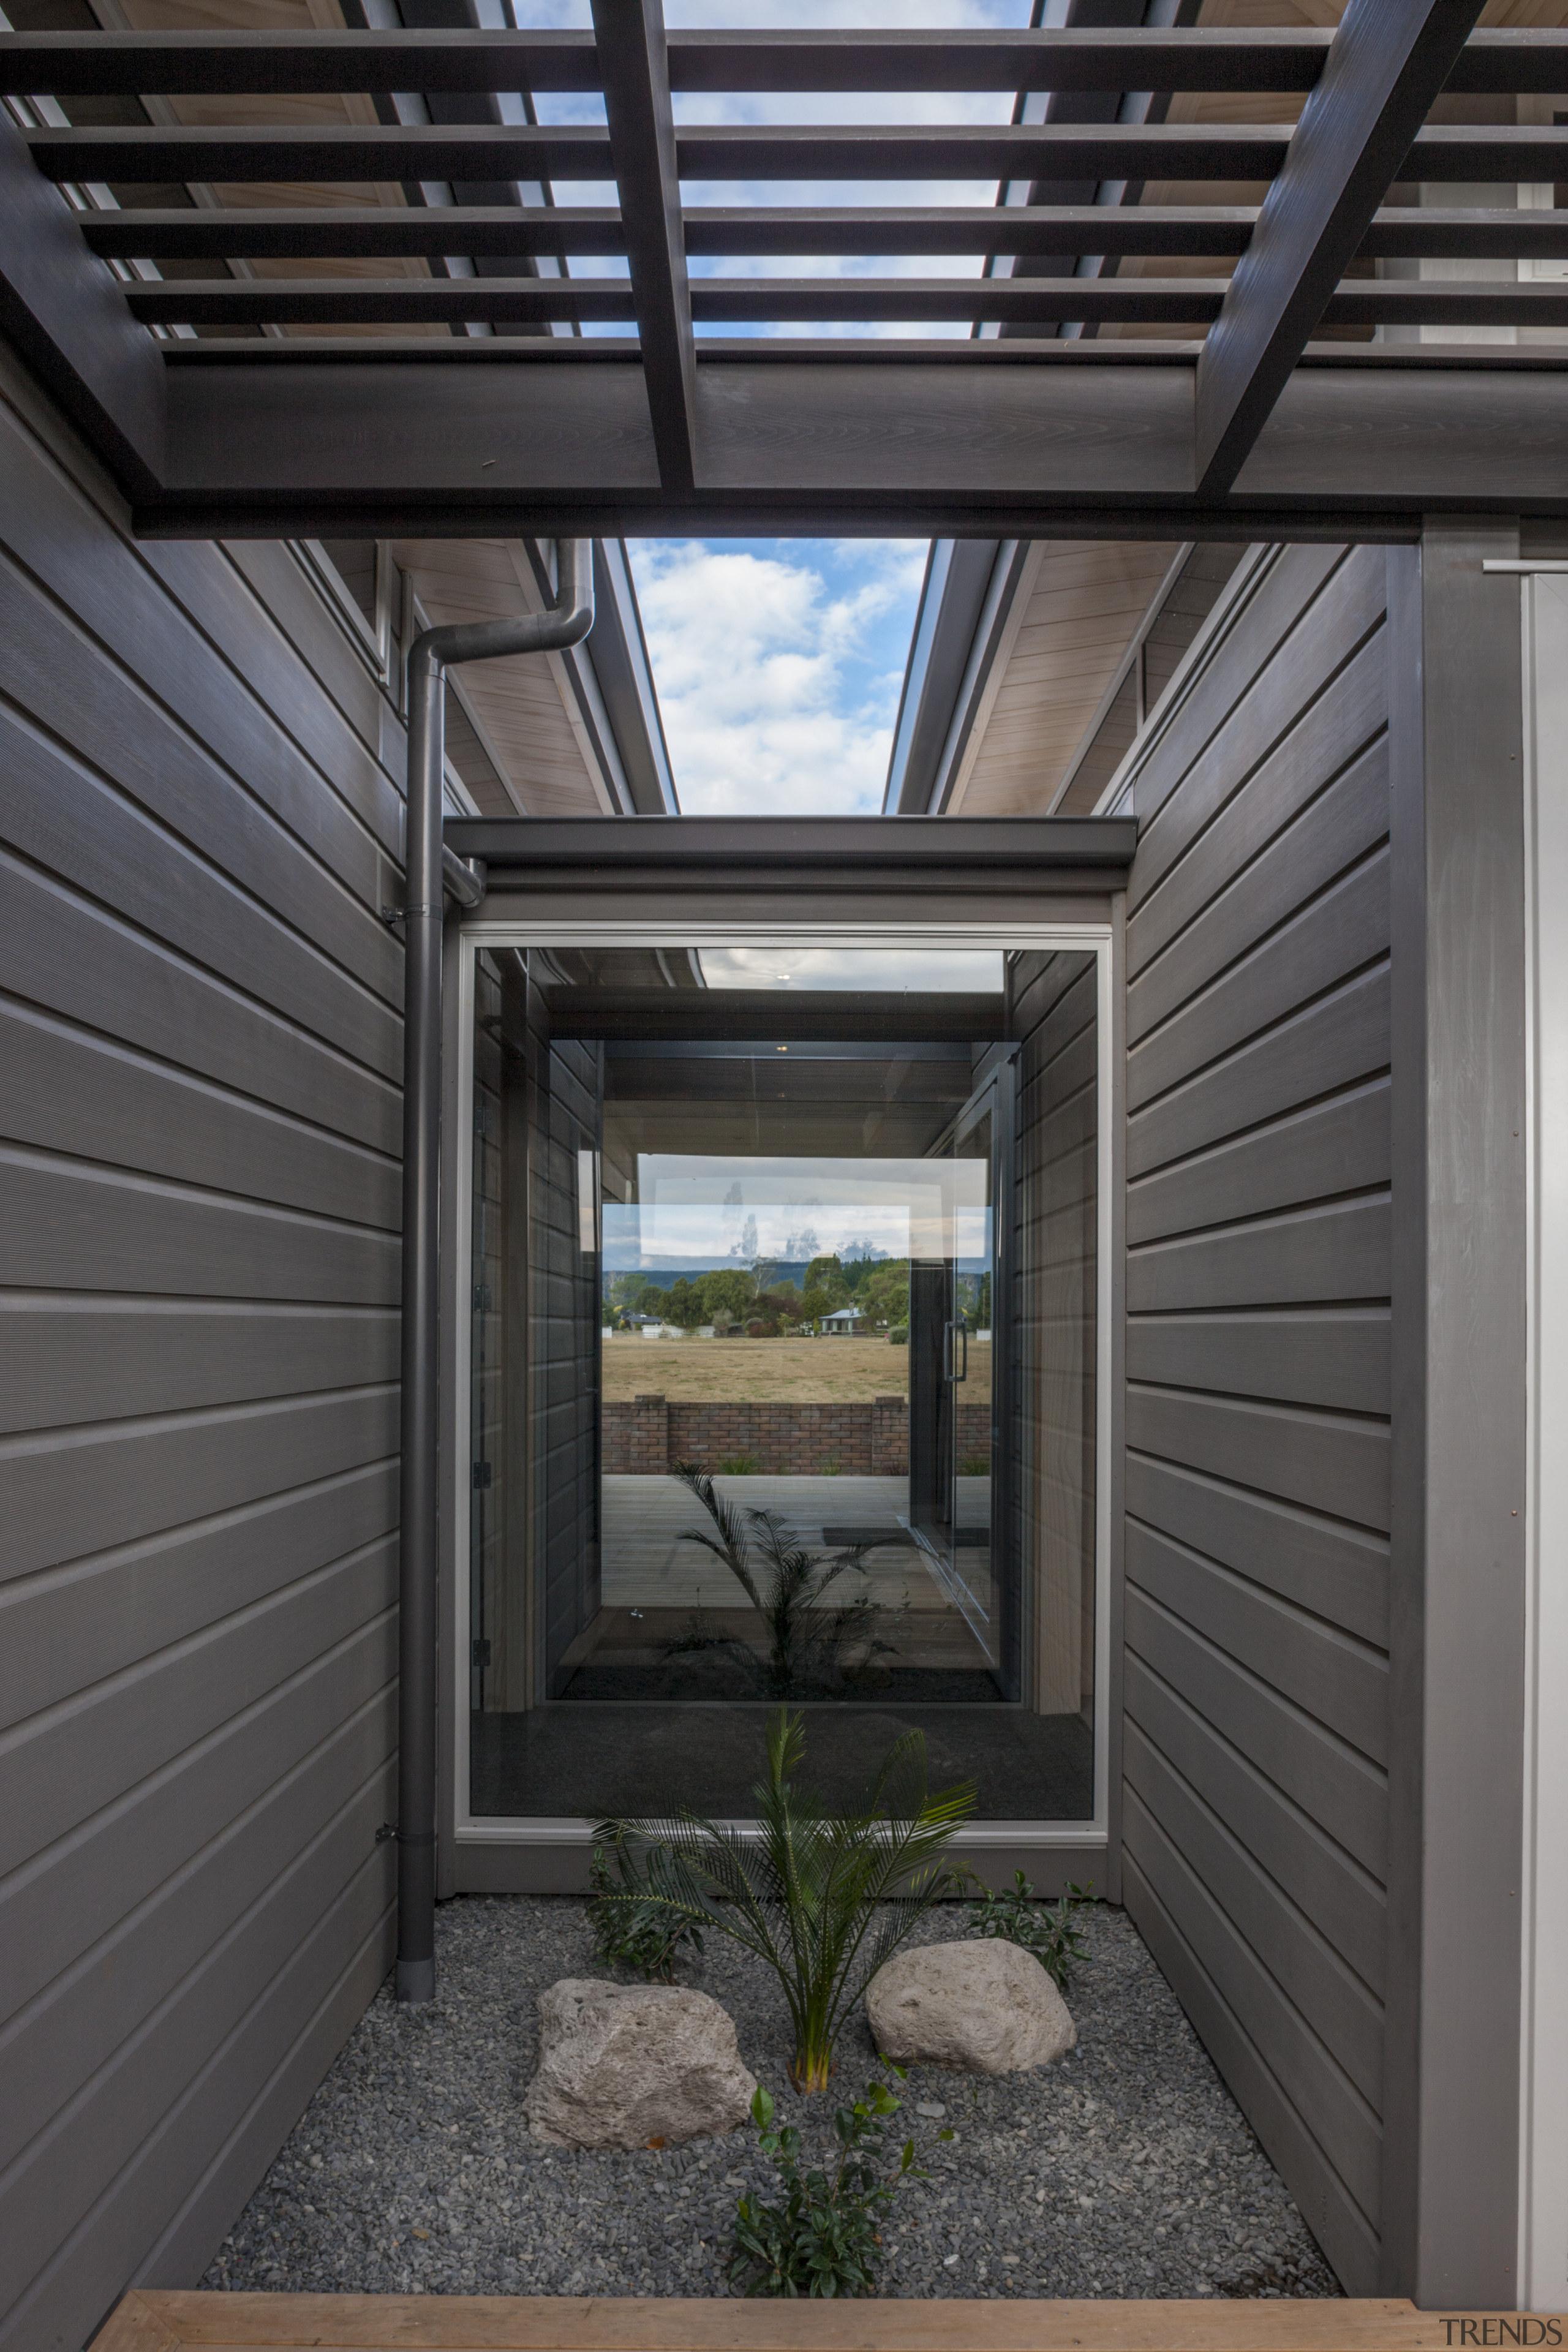 Lockwood Home built by Peter Richards - Lockwood daylighting, facade, home, house, siding, window, black, gray